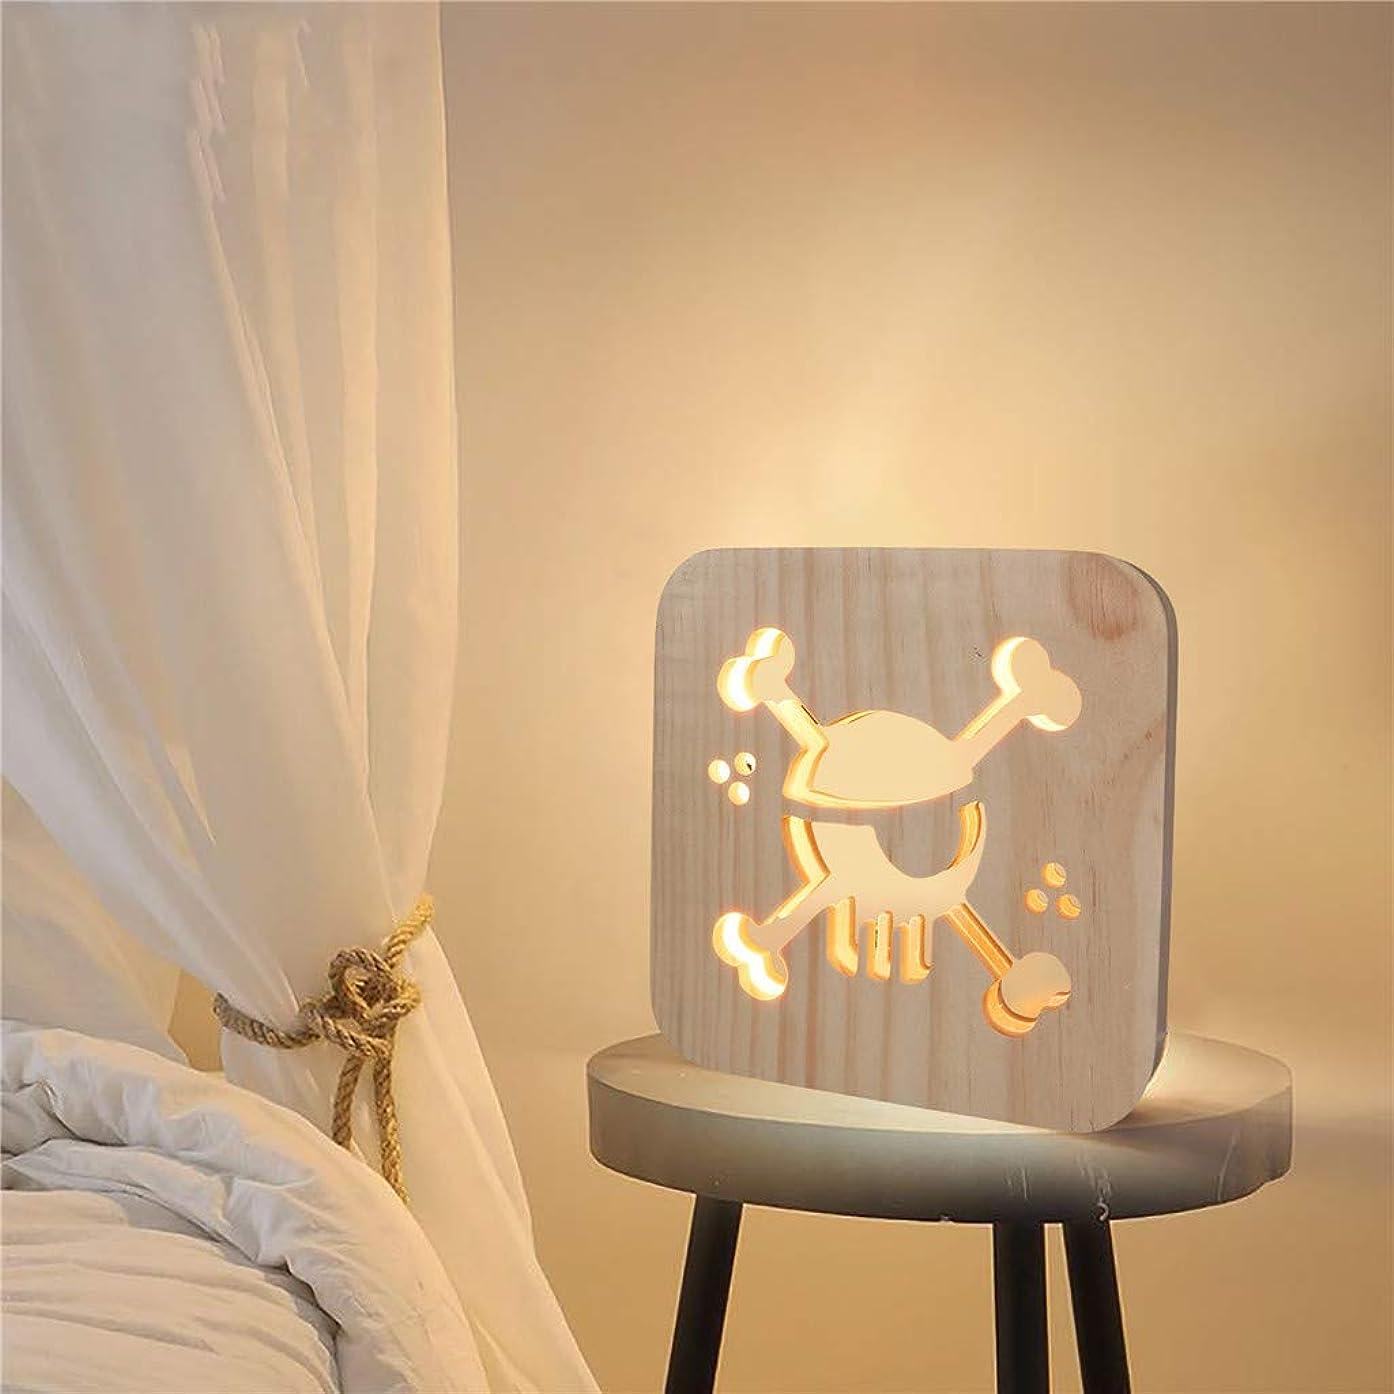 LED Creative Wooden Brand Bedside Lamp, SHUDAGE Craft Bedroom Decoration Nightstand Lamp for Reading/Studying/Relaxation/Bedtime, Desk Light for Office, Bedside, College Dorm, Living Room (B)